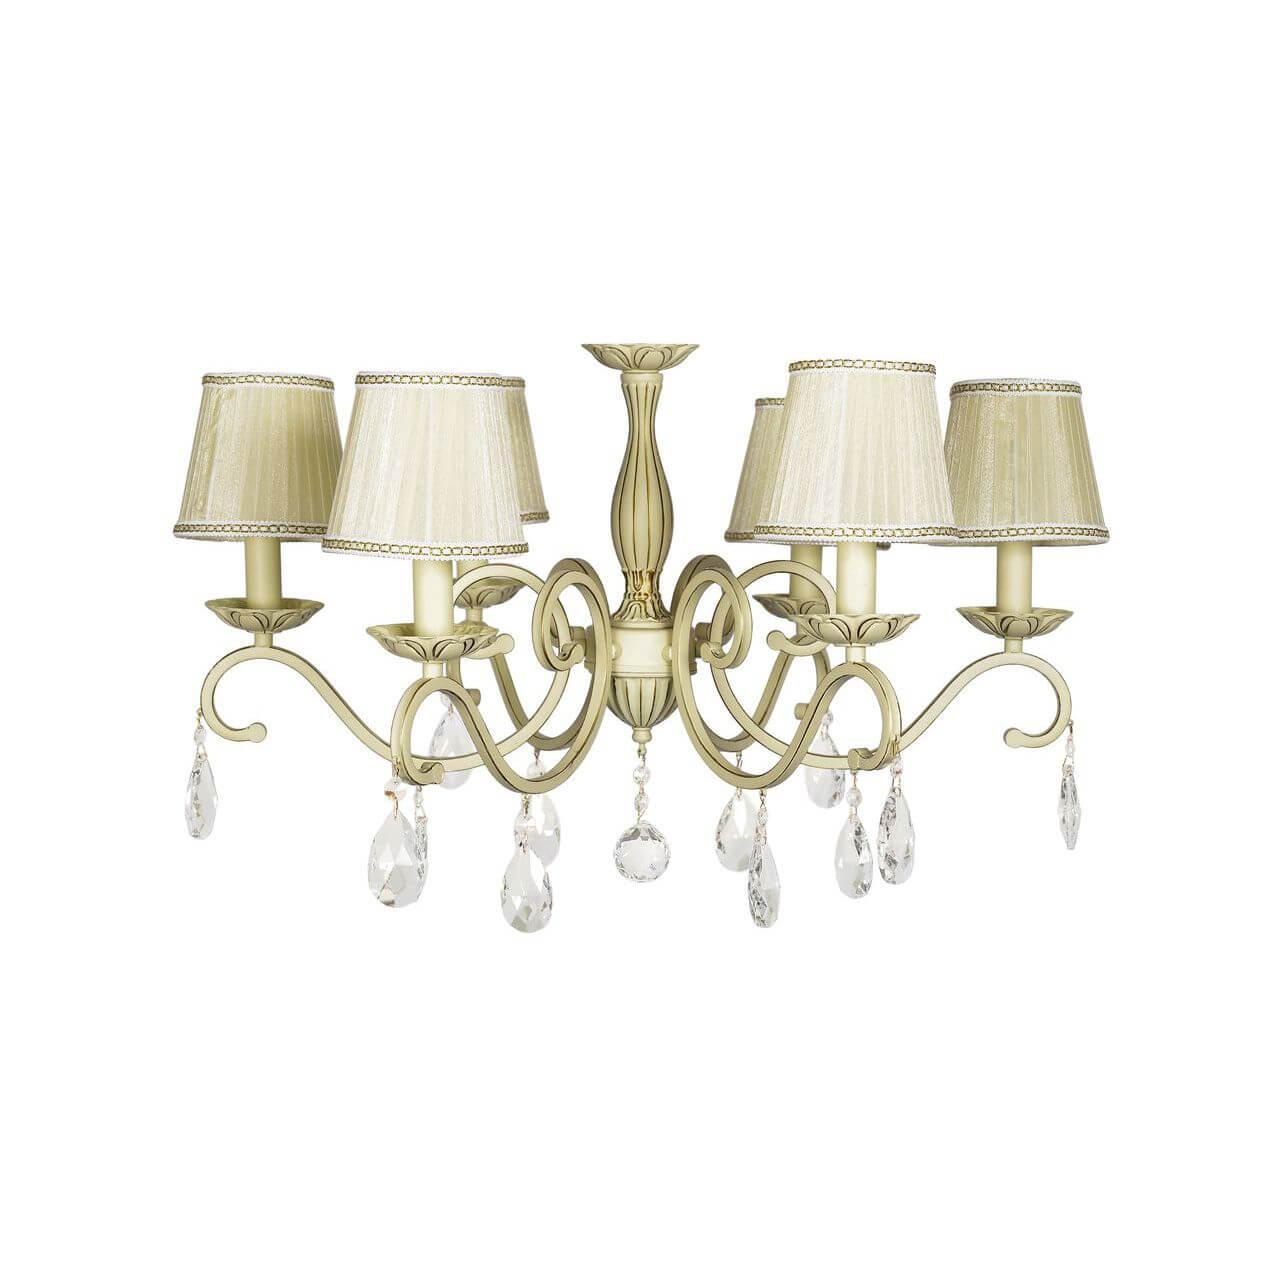 Потолочный светильник Lucia Tucci Bari 370.6 Cream White, E14, 40 Вт потолочная люстра lucia tucci bari 370 8 cream white